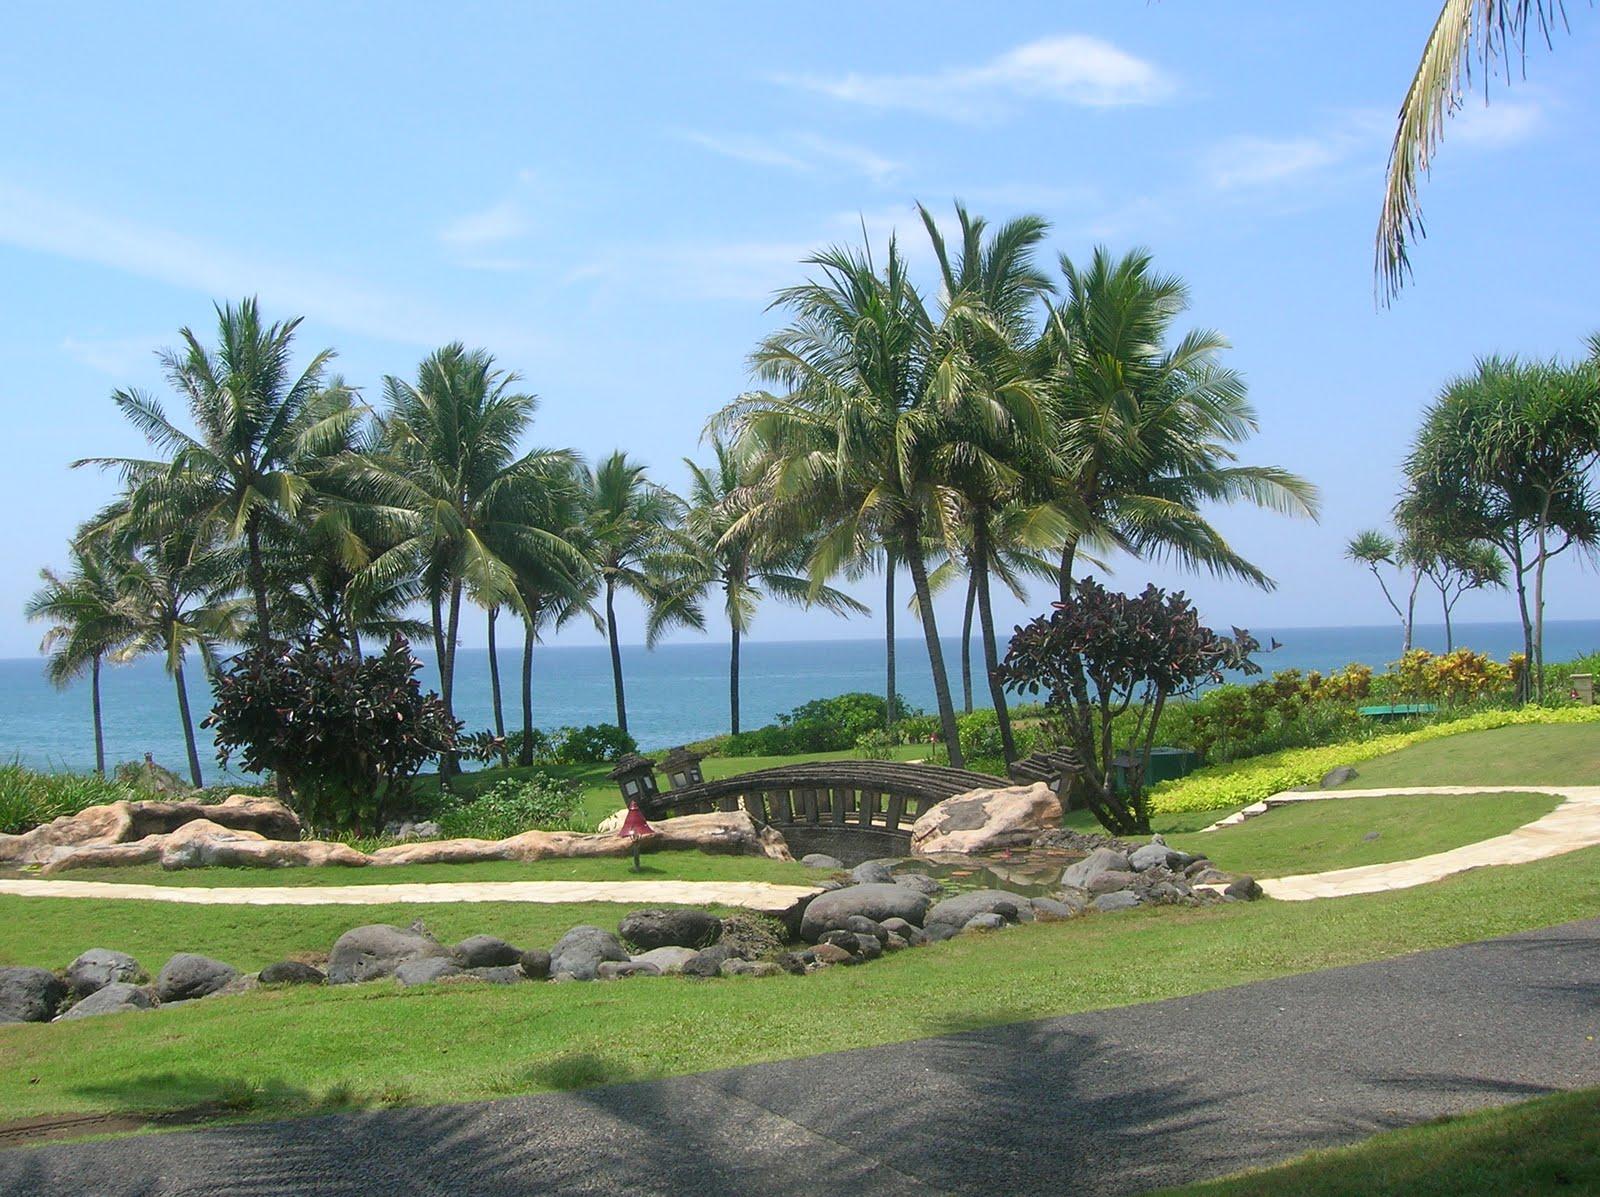 Bali Indonesia Beaches